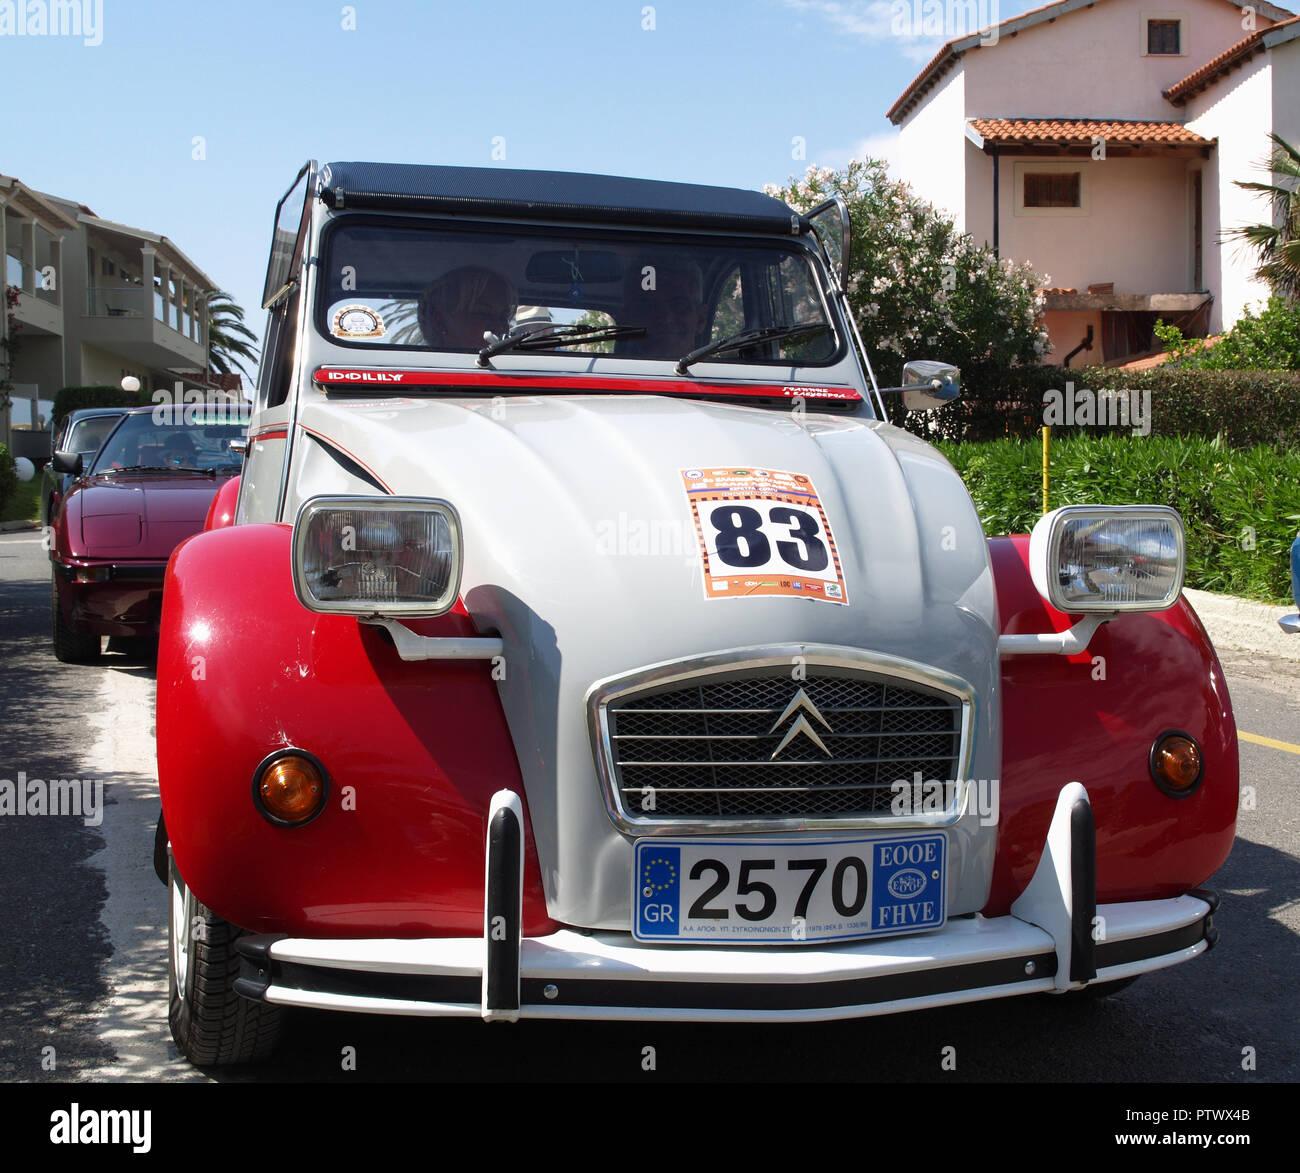 Vintage Citroen 2CV Dolly on display at the 8th Hellenic Bulgarian LEKAM classic car rally at the Acharavi Park Hotel, Acharavi, Corfu, Greece - Stock Image